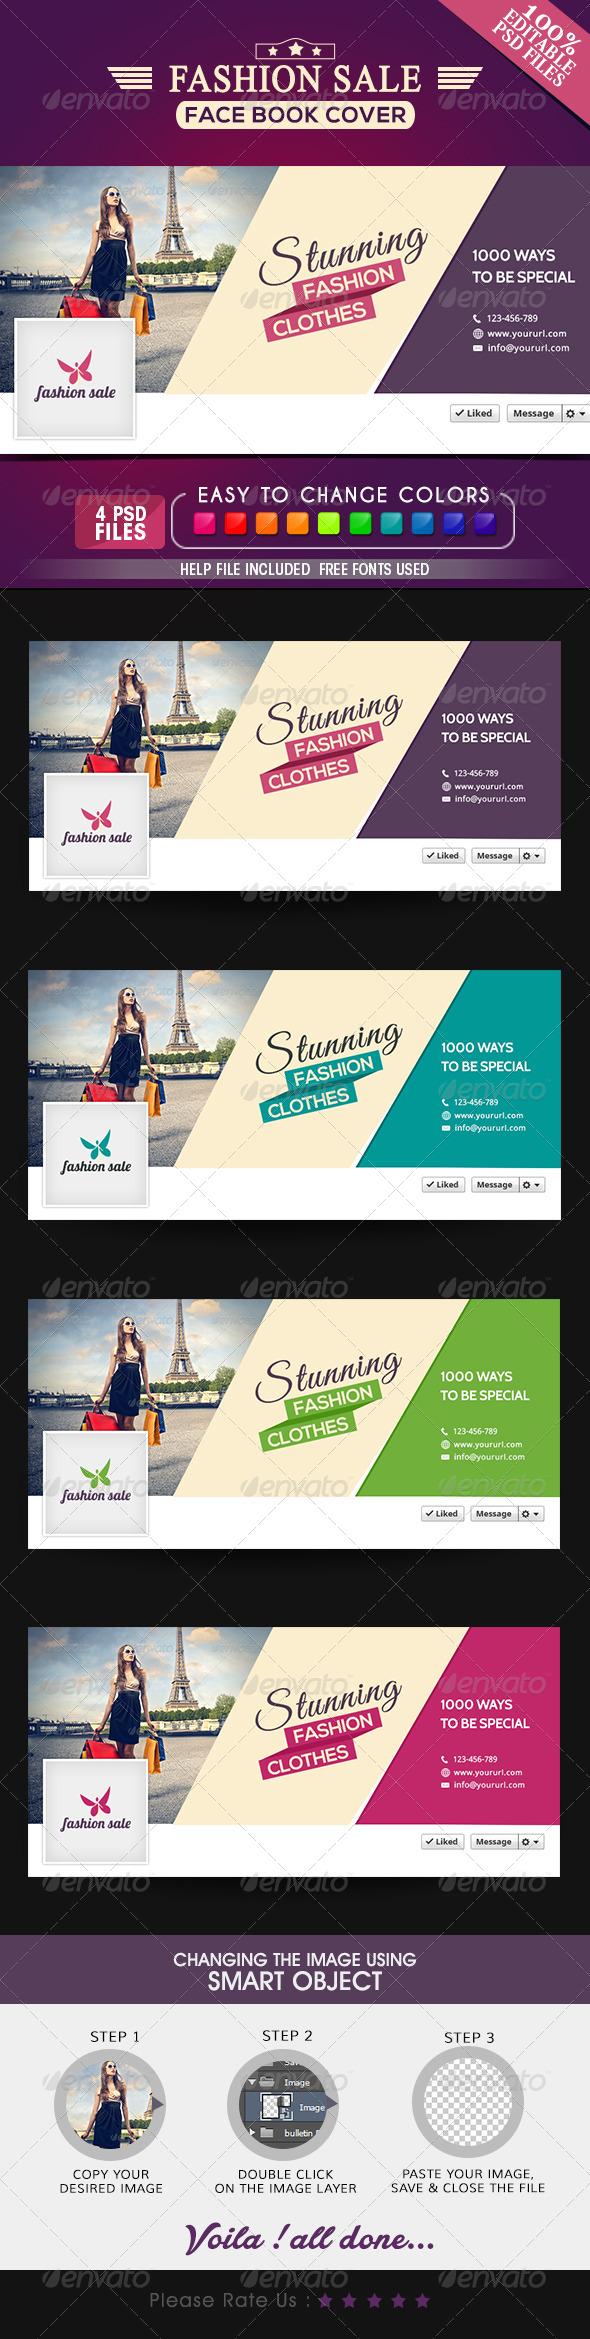 Facebook cover fashion graphics designs templates flashek Choice Image